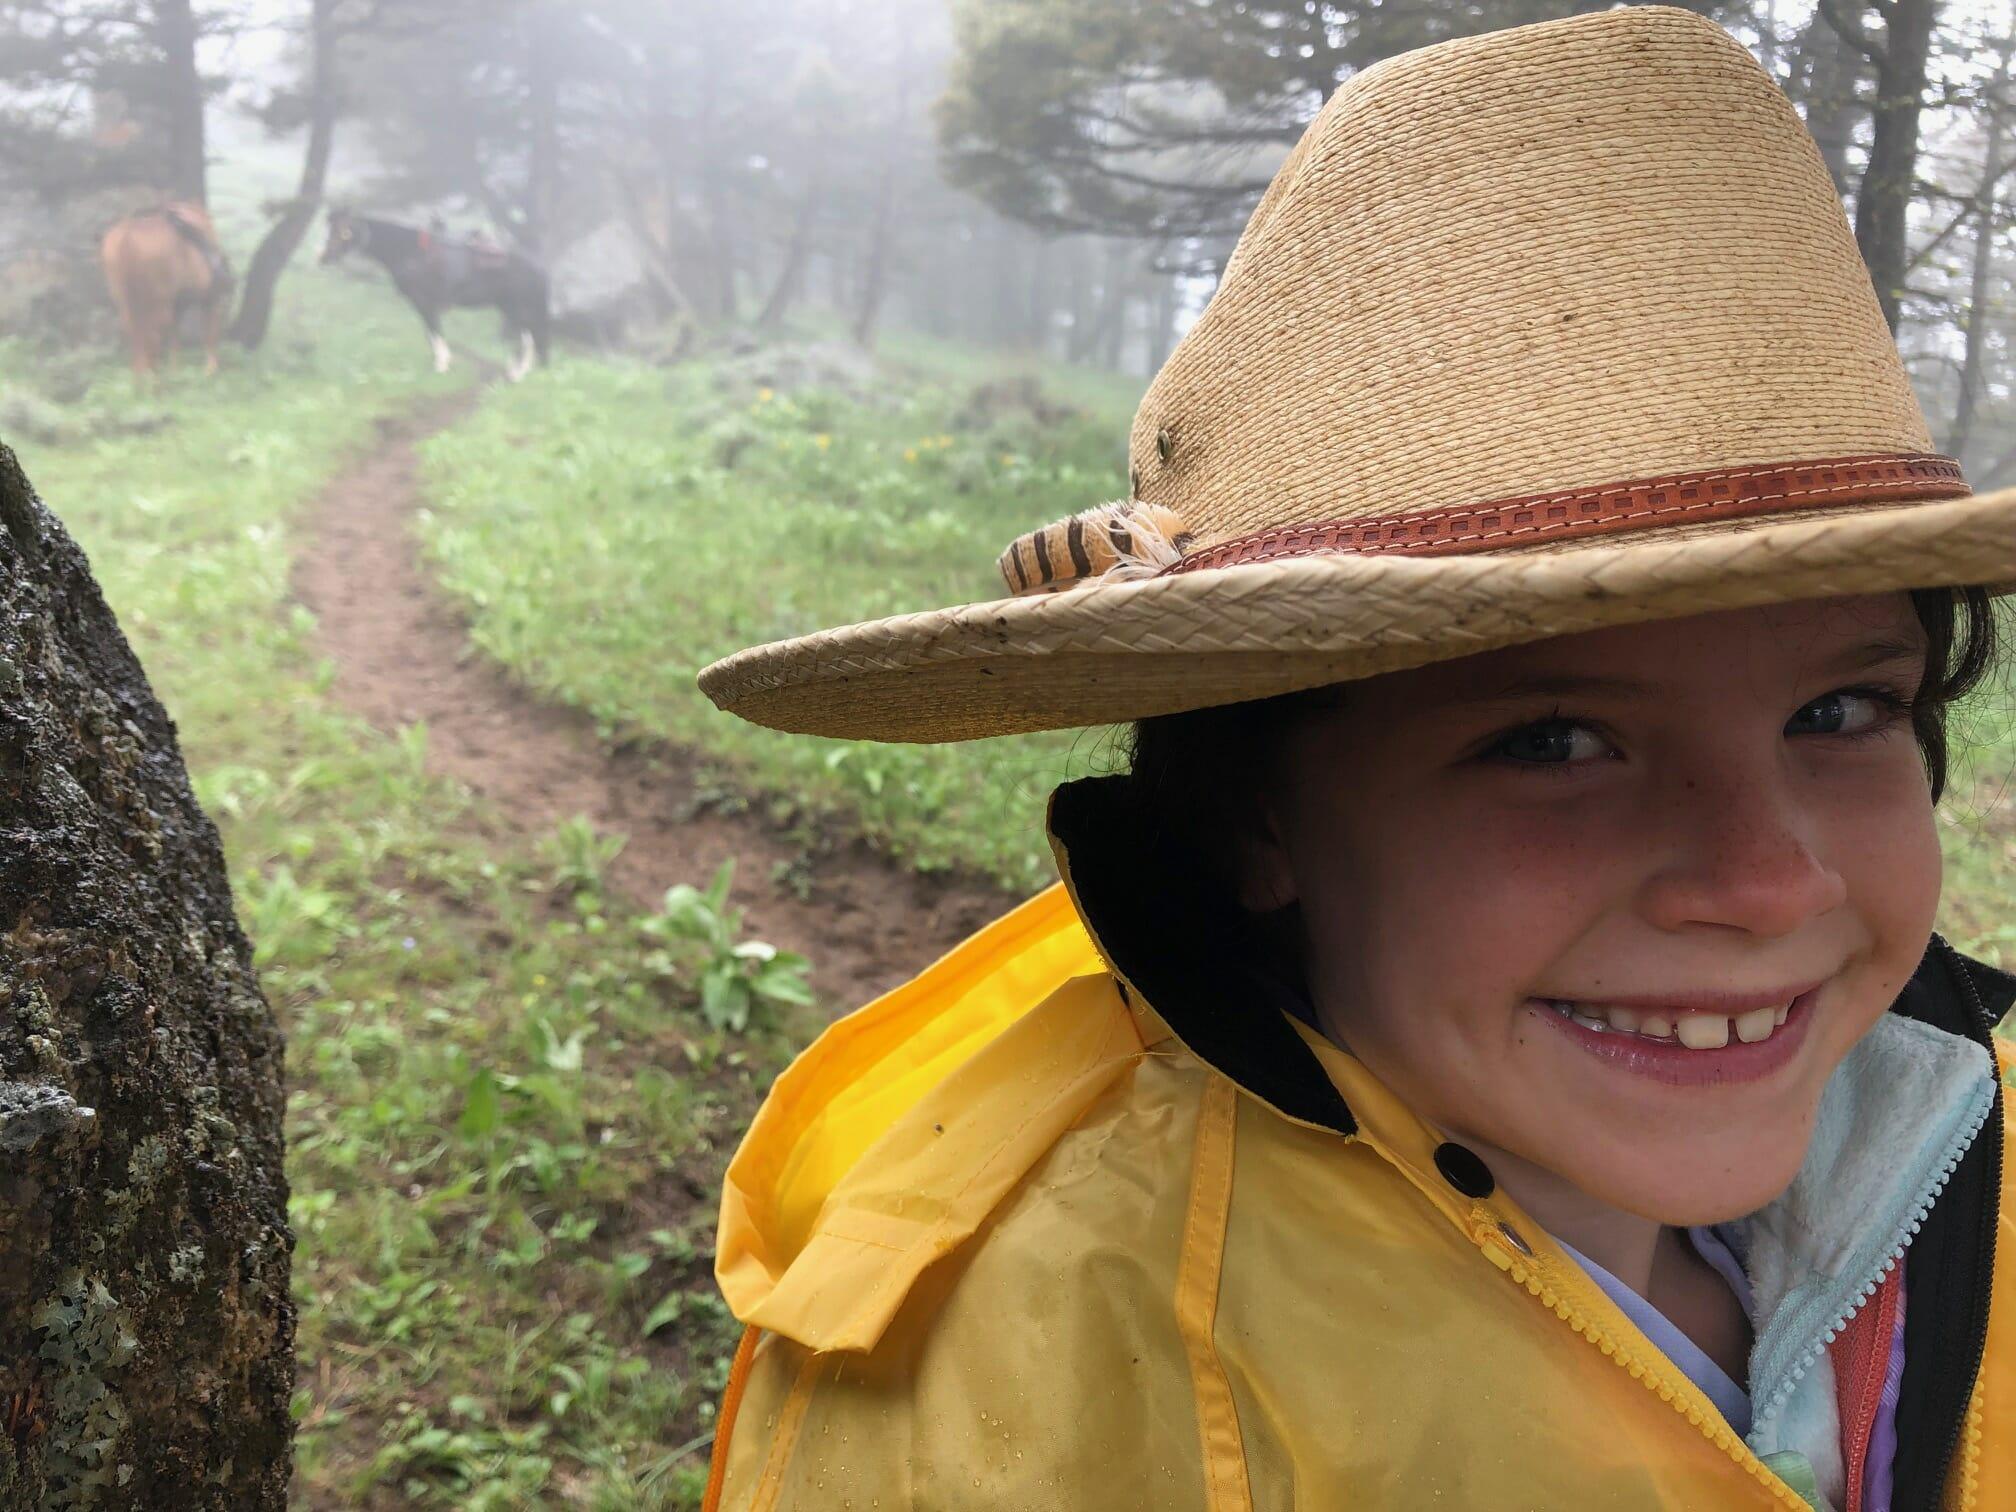 A little girl wearing a cowboy hat smiles amid a Montana rain storm.